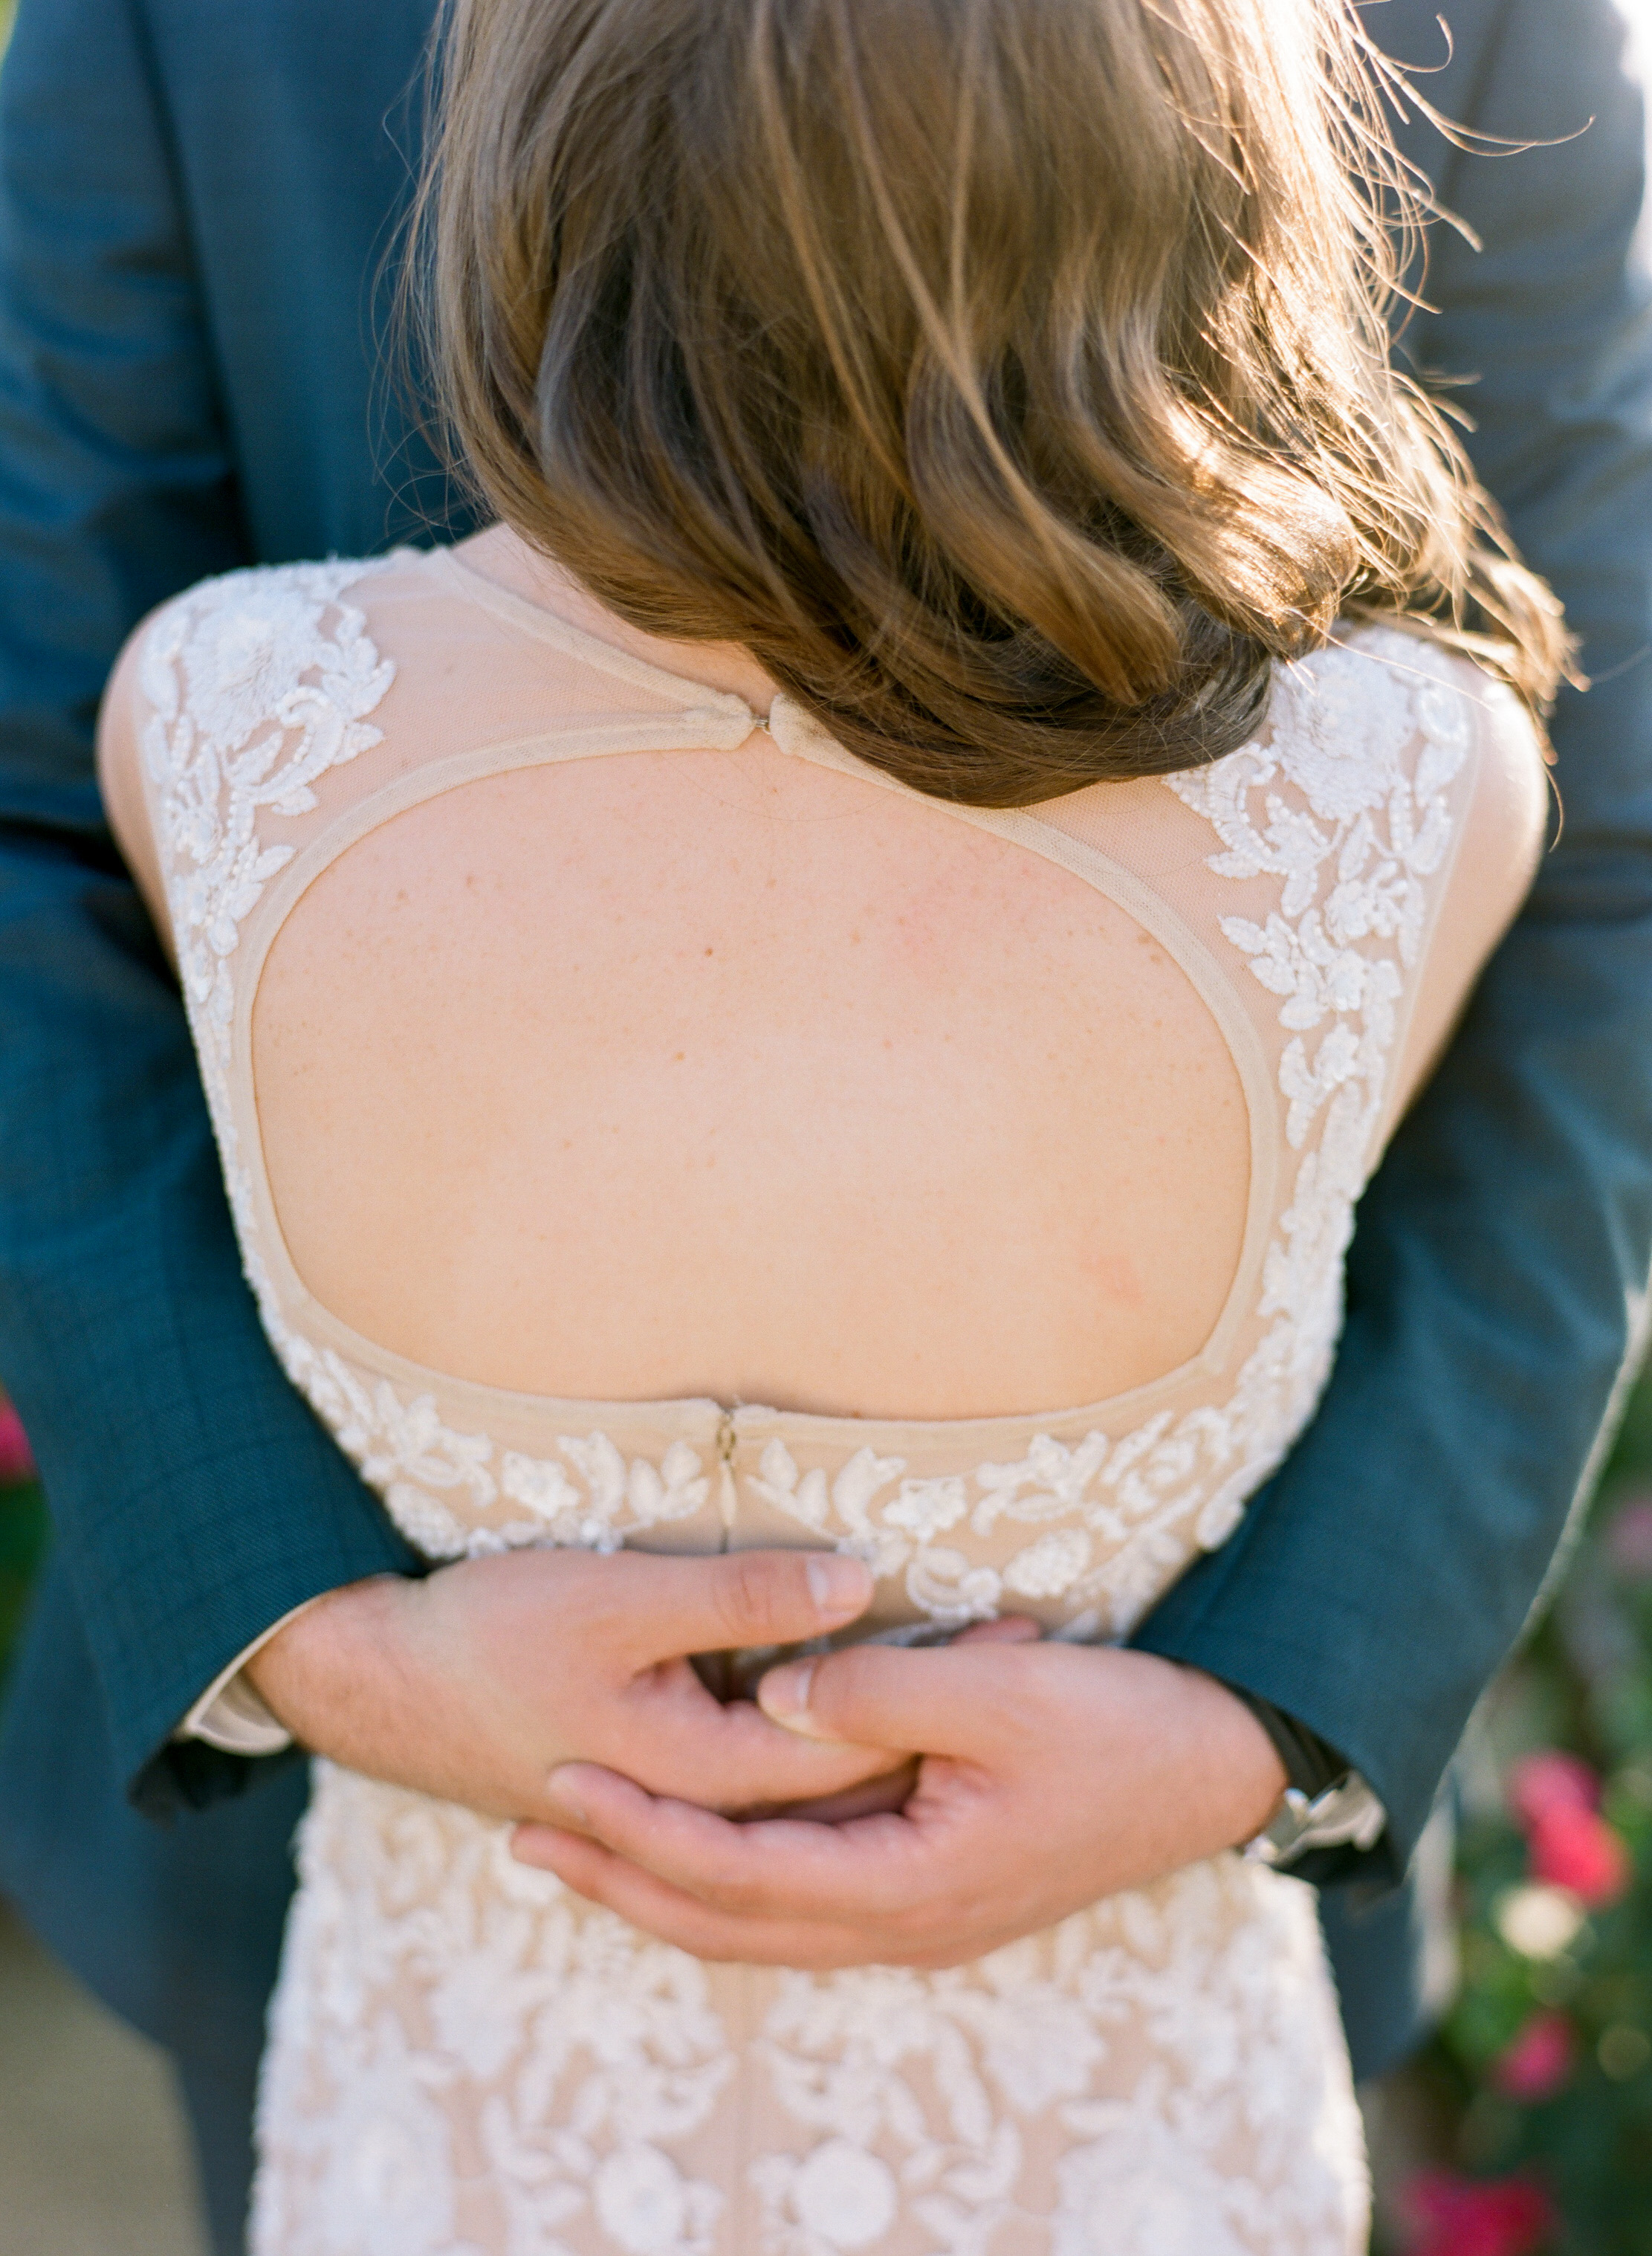 Dana-Fernandez-Photography-Destination-Wedding-Photographer-Cabo-San-Lucas-Film-Houston-Texas-Cabo-7.jpg